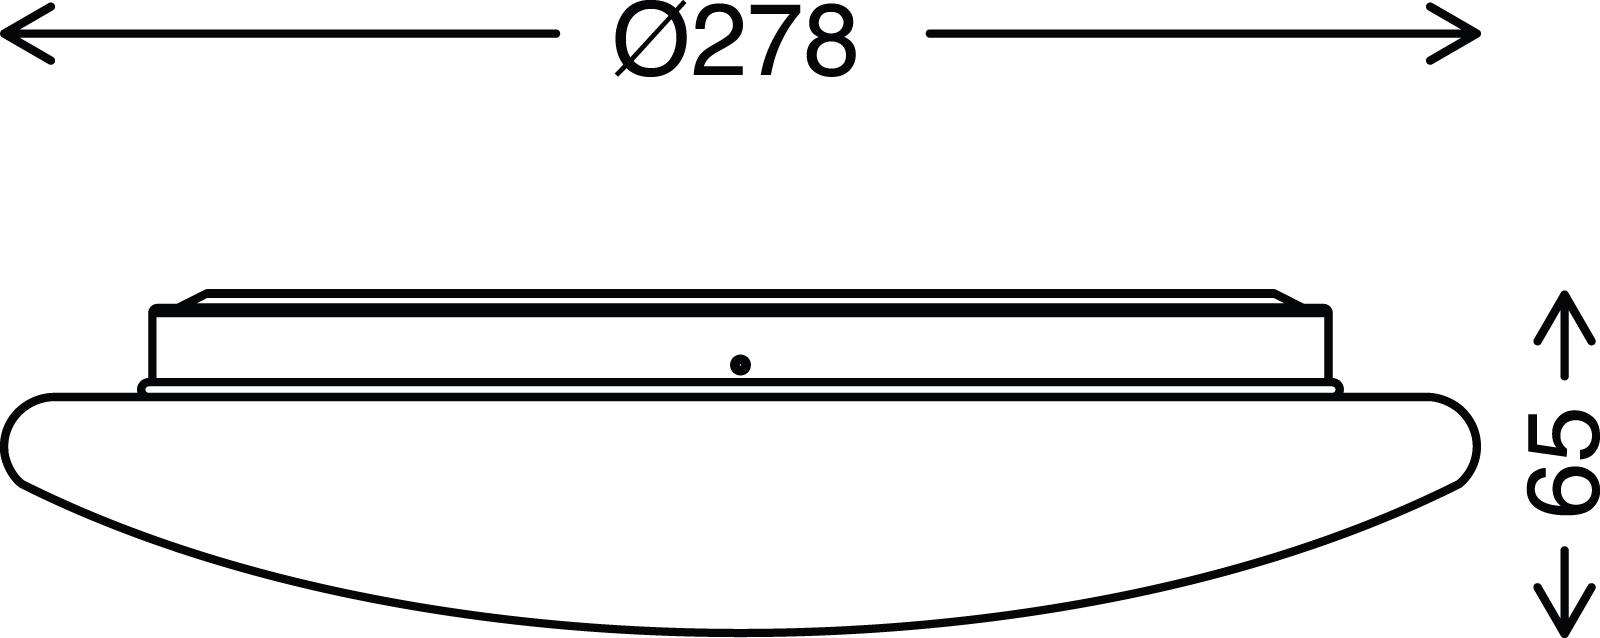 TELEFUNKEN LED Sensor Deckenleuchte, Ø 27,8 cm, 15 W, Weiss